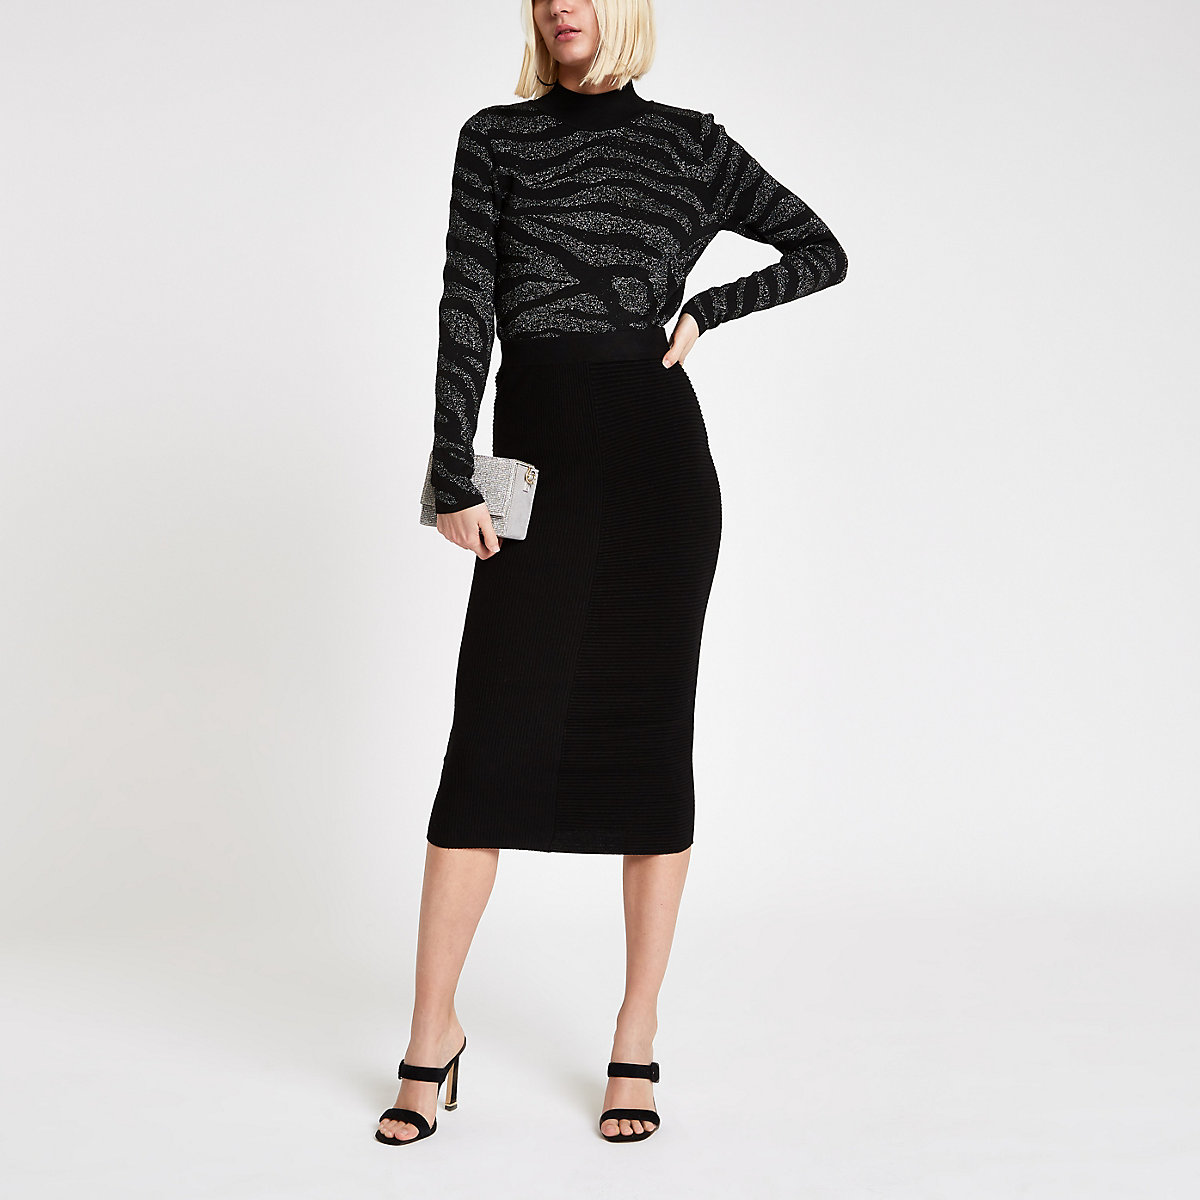 Black knit midi skirt